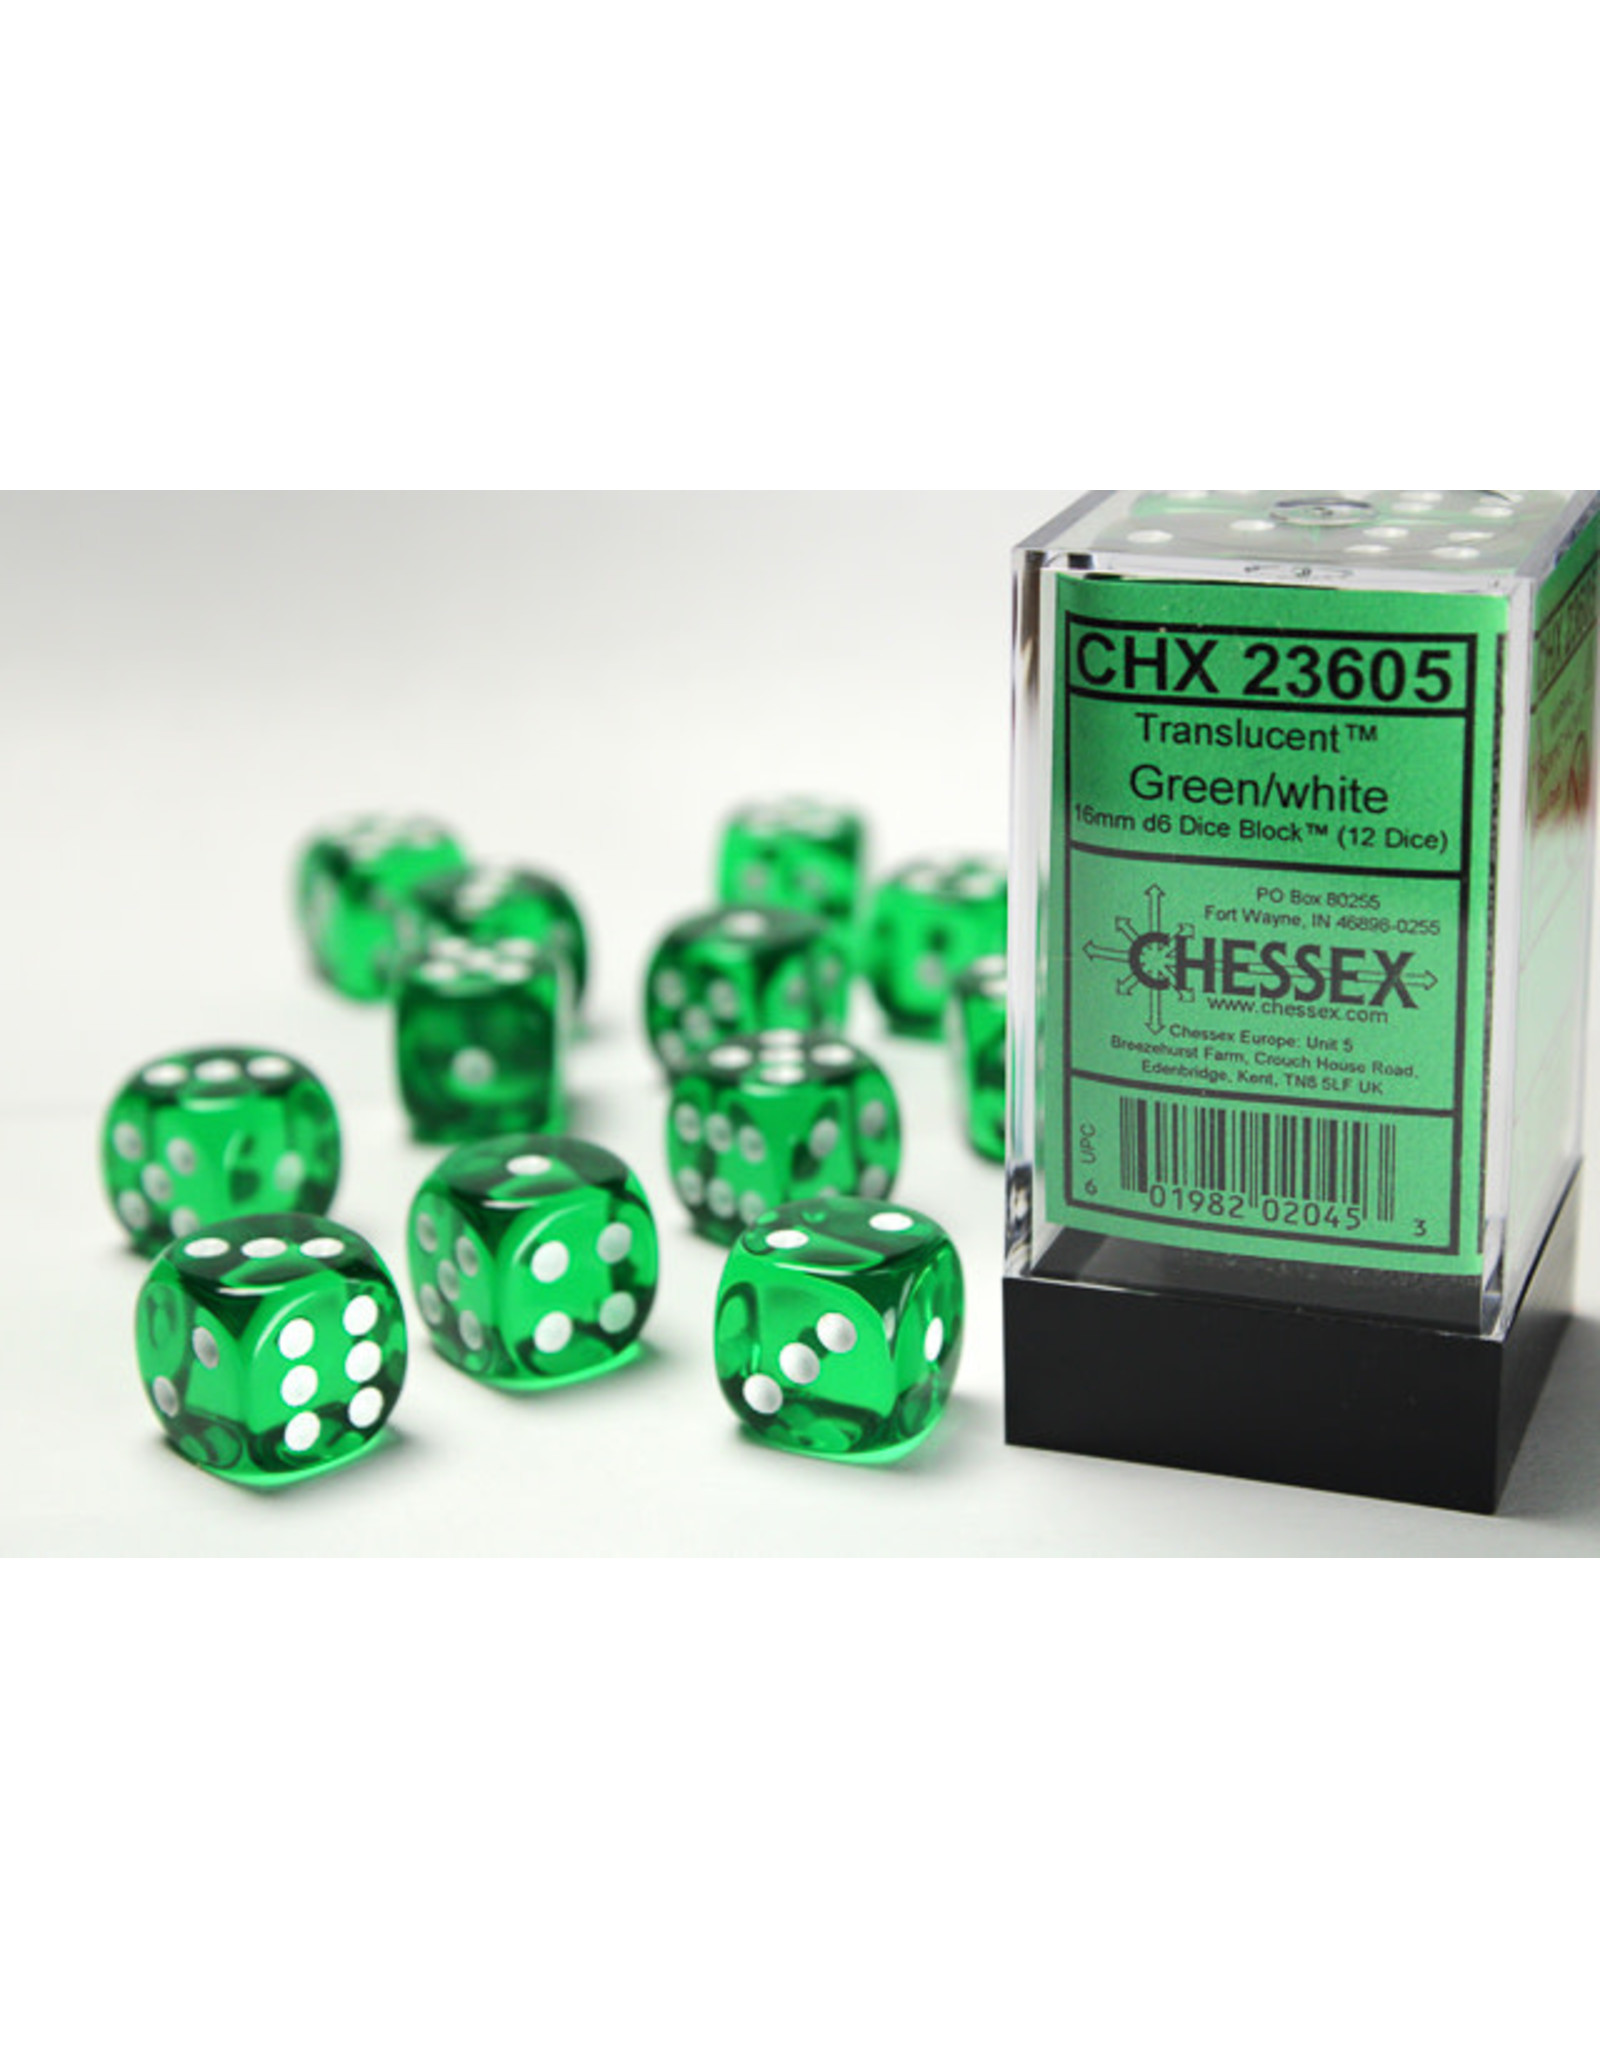 Chessex Chessex Translucent 16mm (12d6)